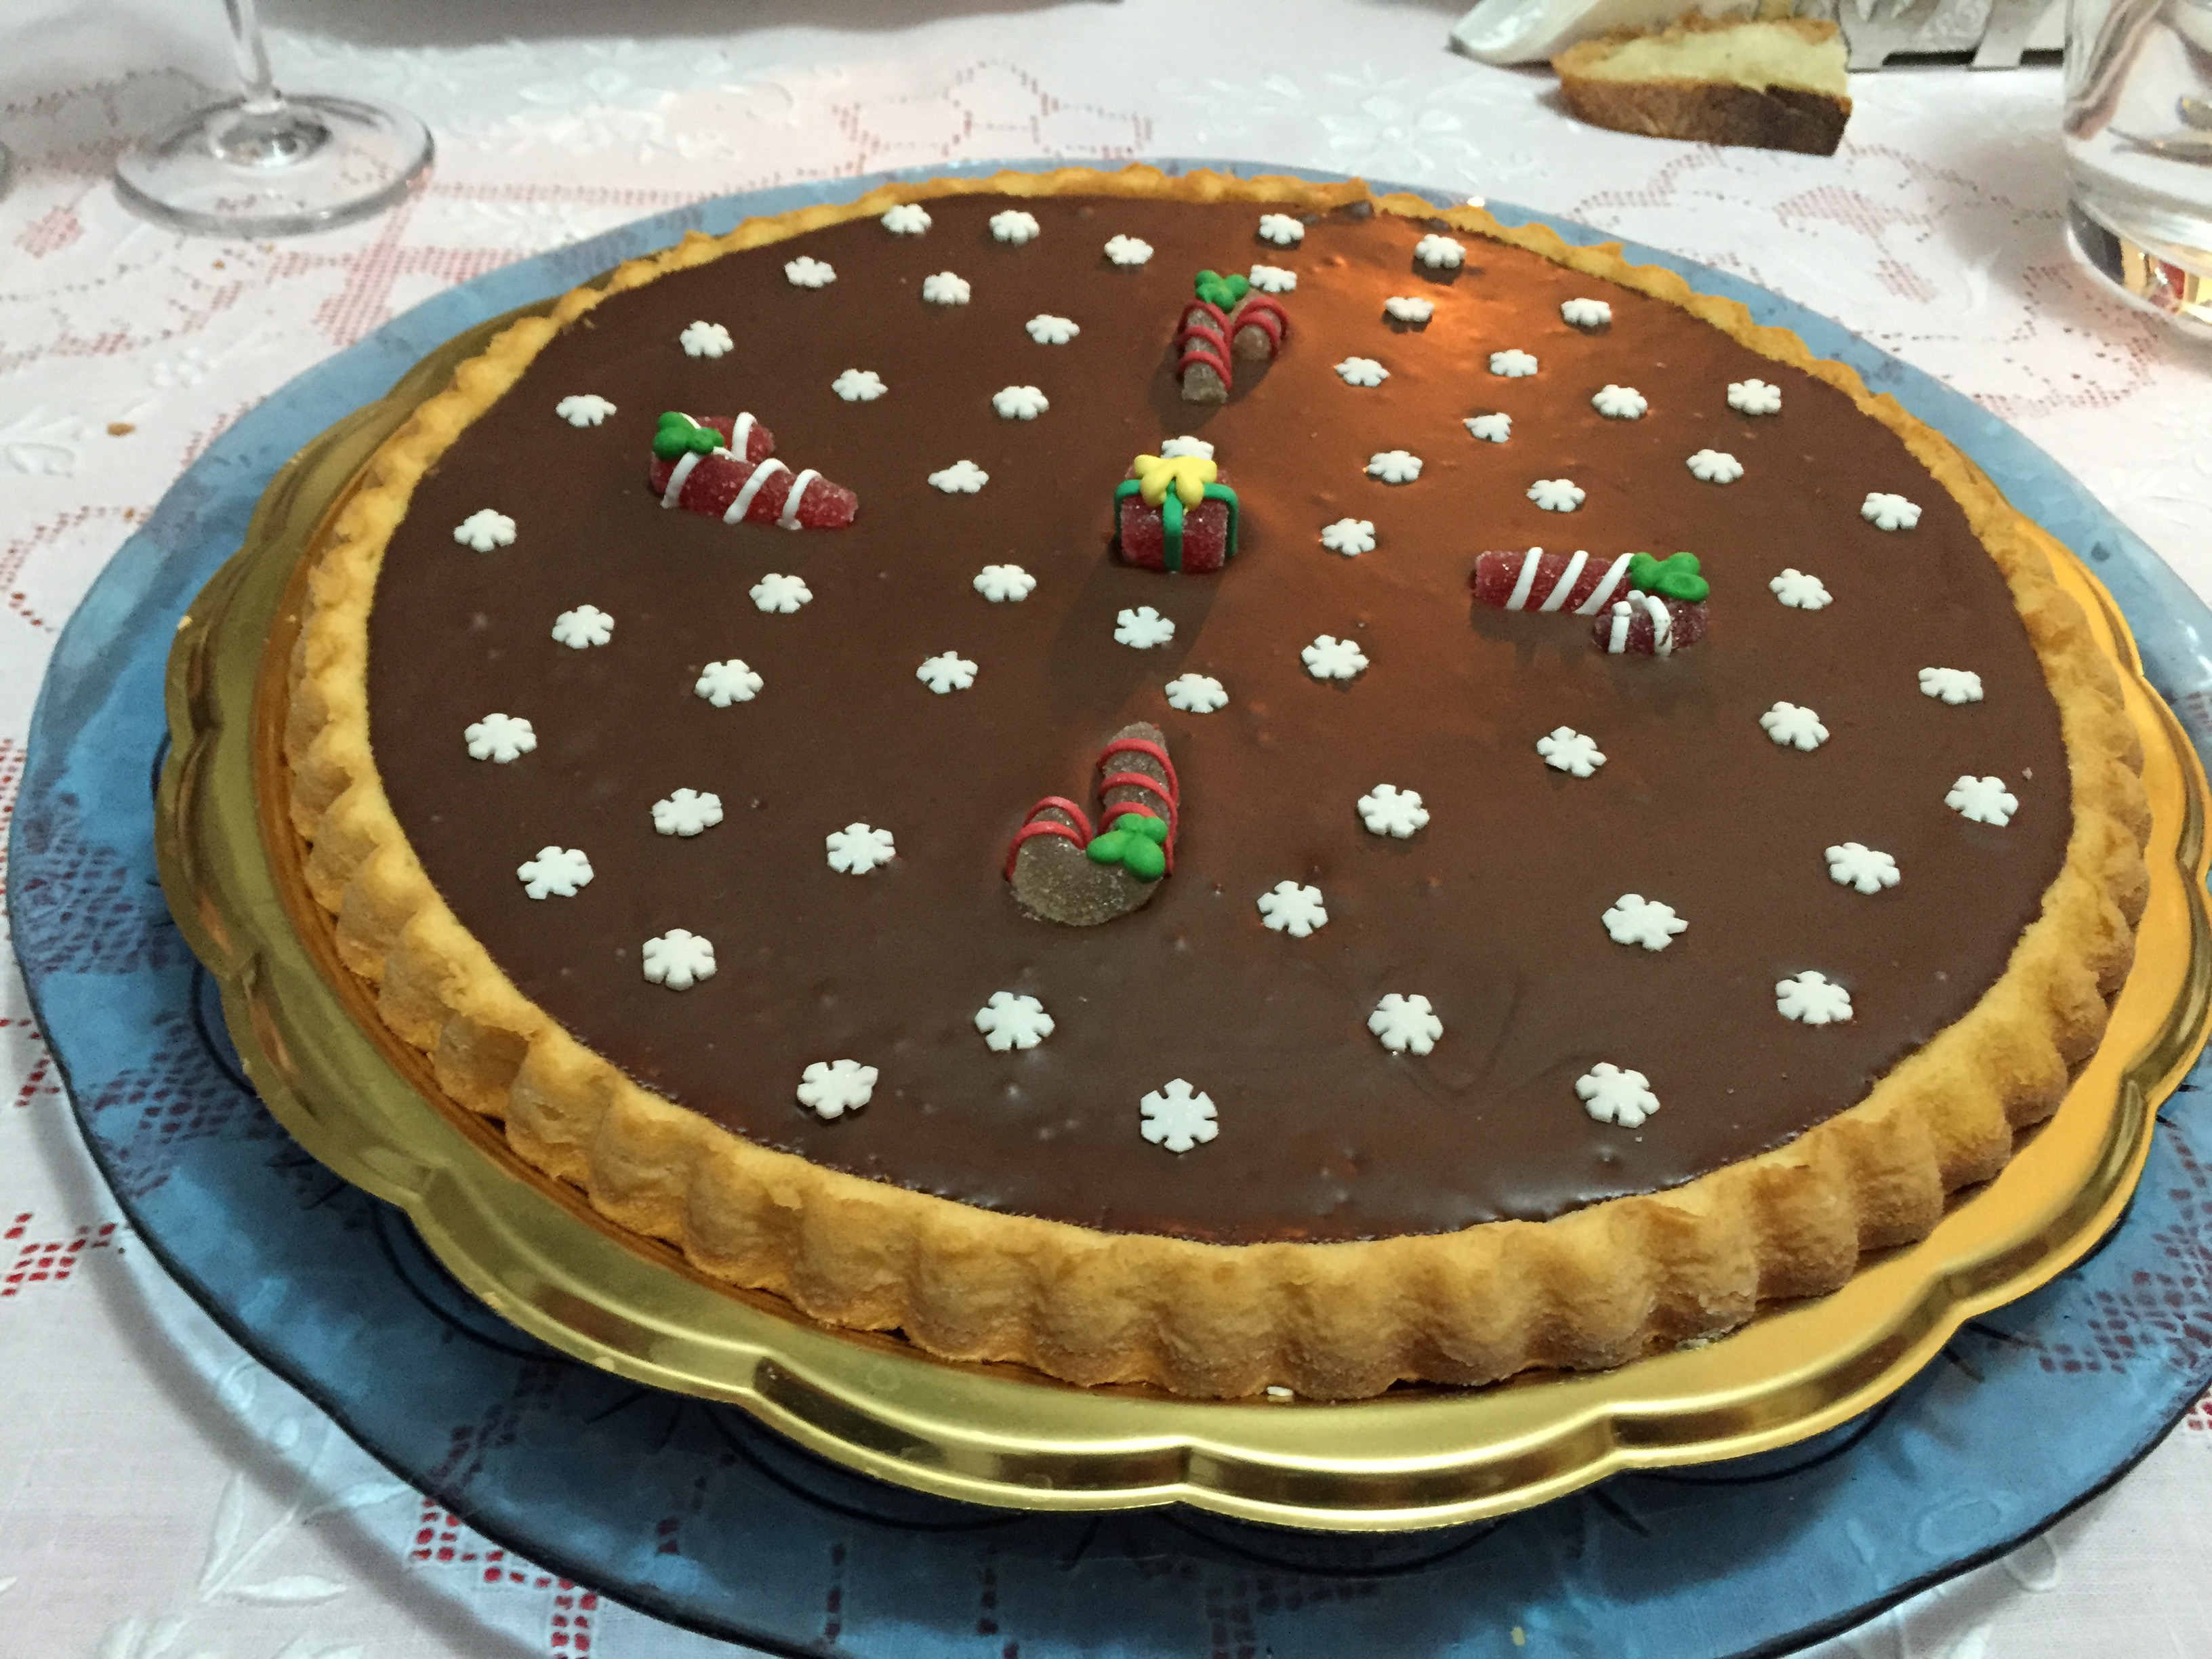 Top Crostata morbida Nutella e Kinder | Ricci e sfizi UD17